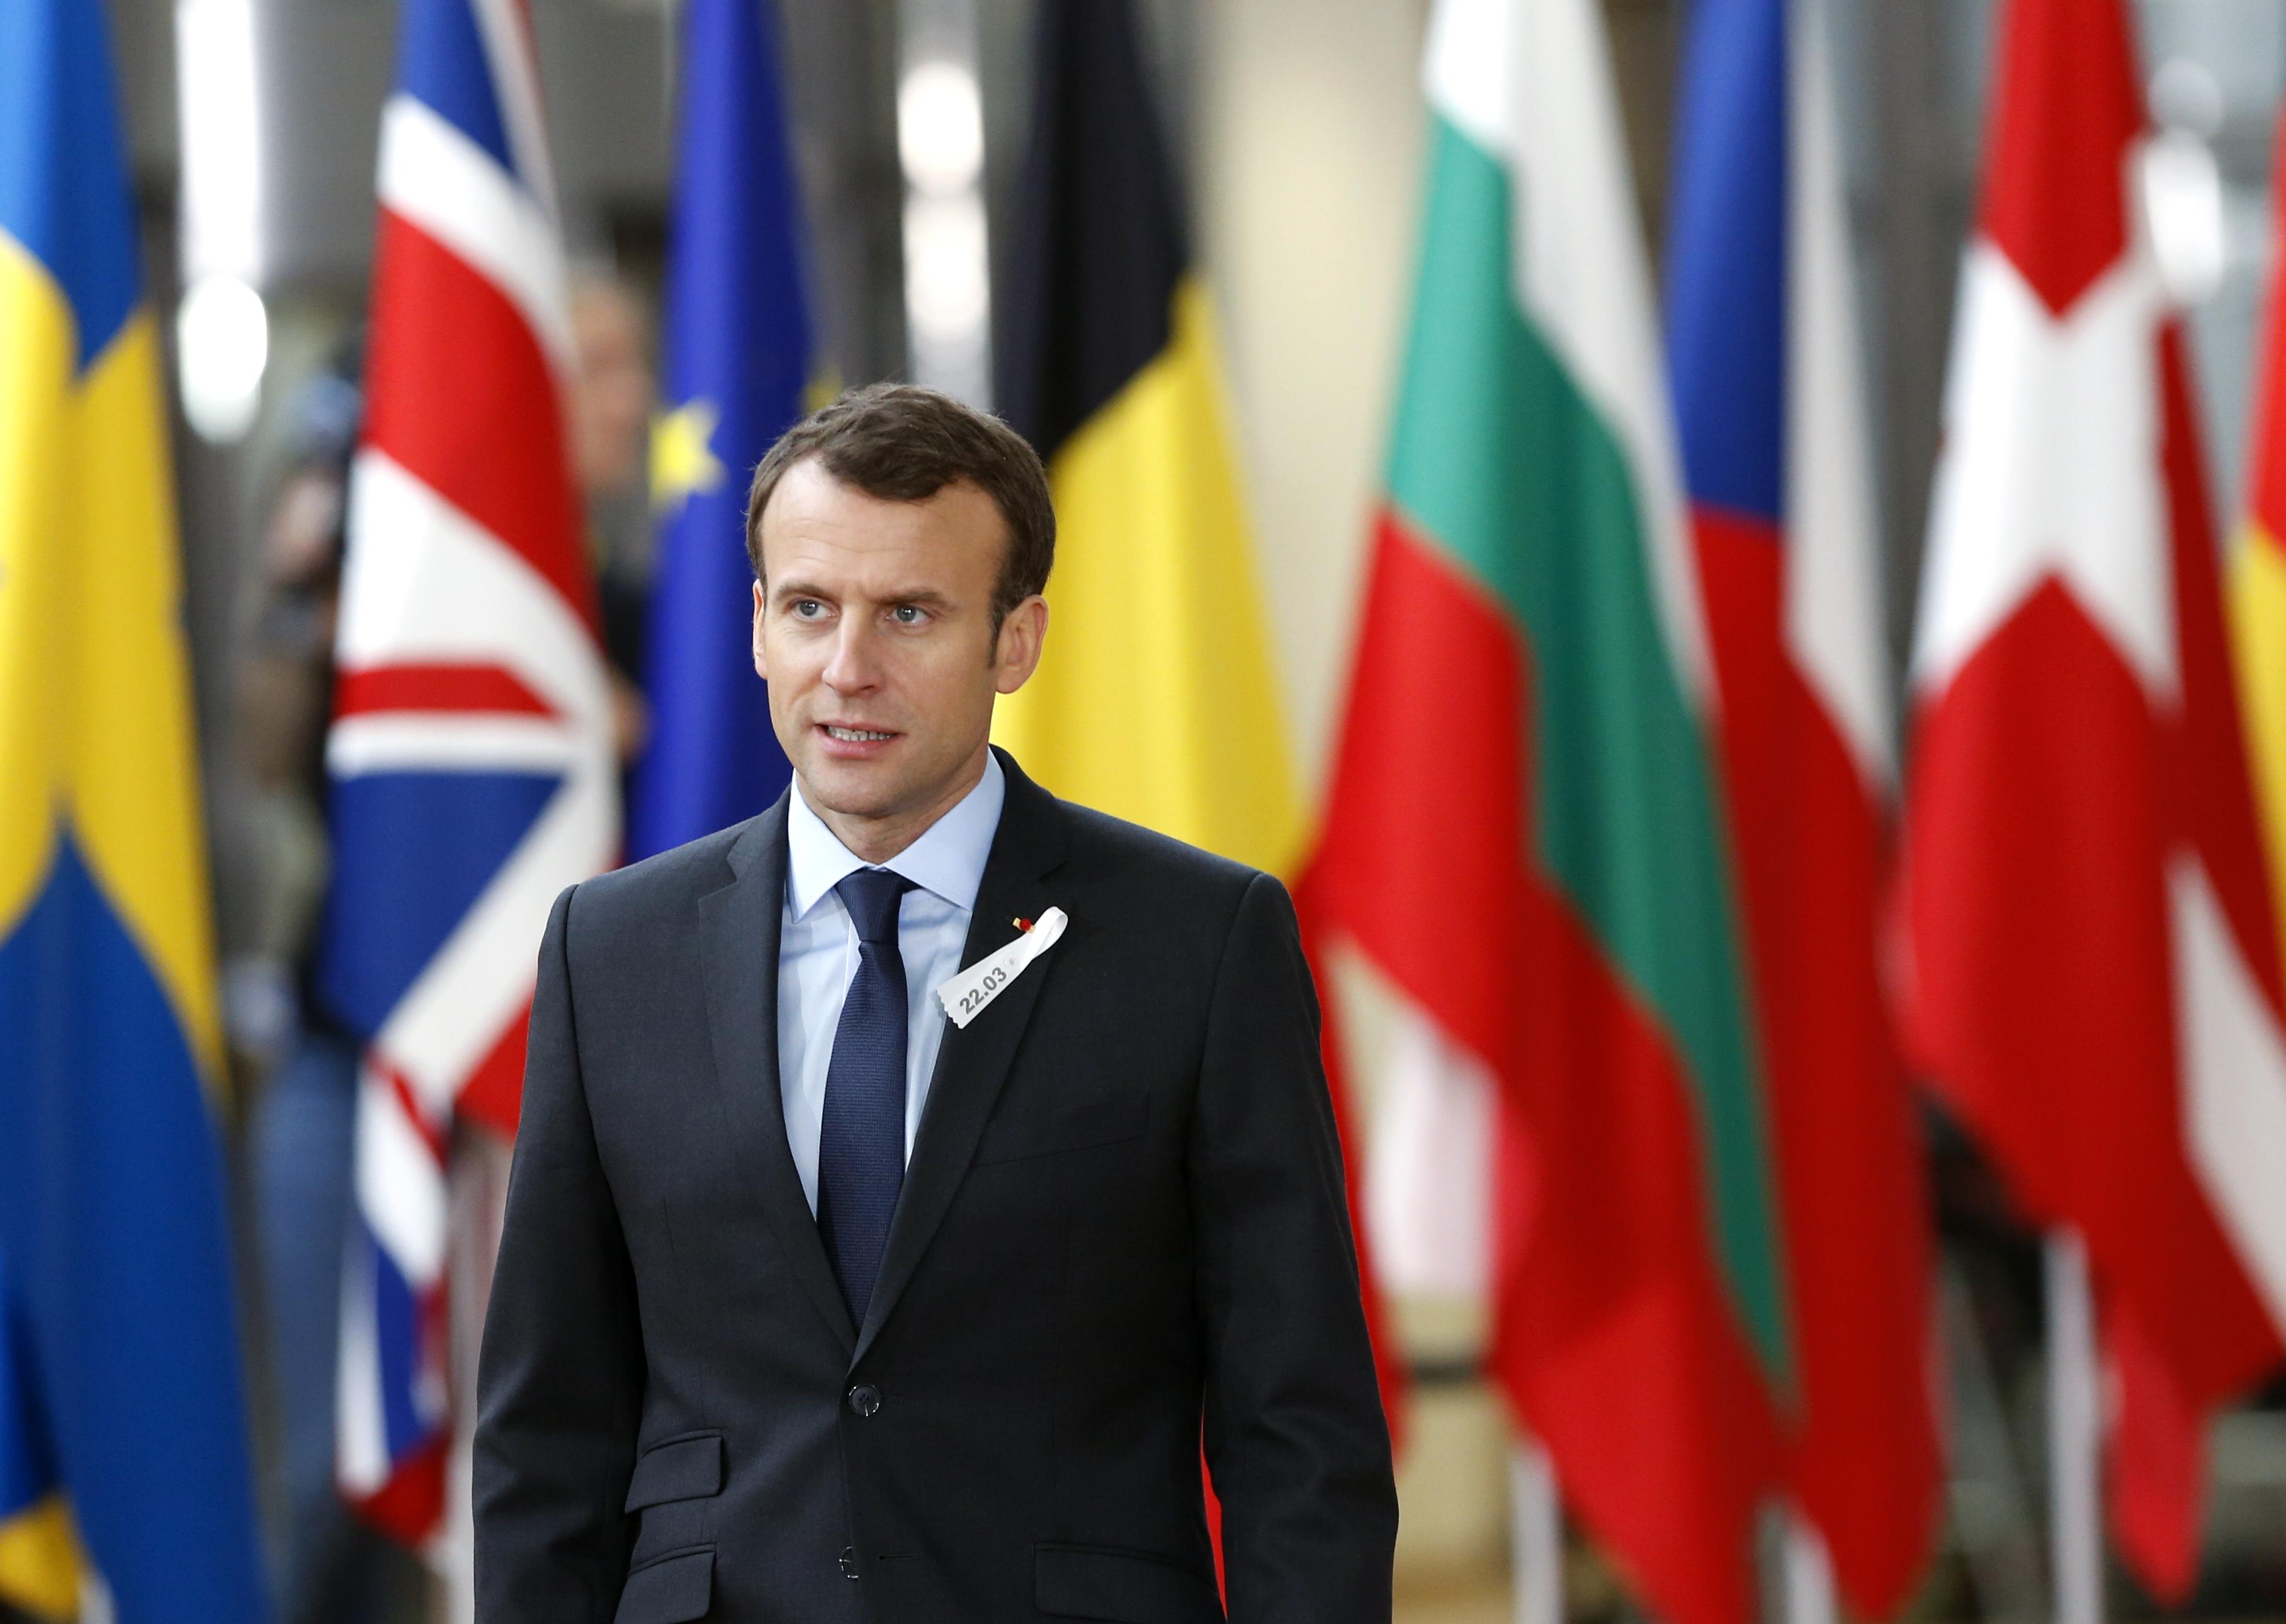 France's President Emmanuel Macron arrives at a European Union leaders summit in Brussels, Belgium, March 22, 2018. REUTERS/Francois Lenoir - UP1EE3M13213M